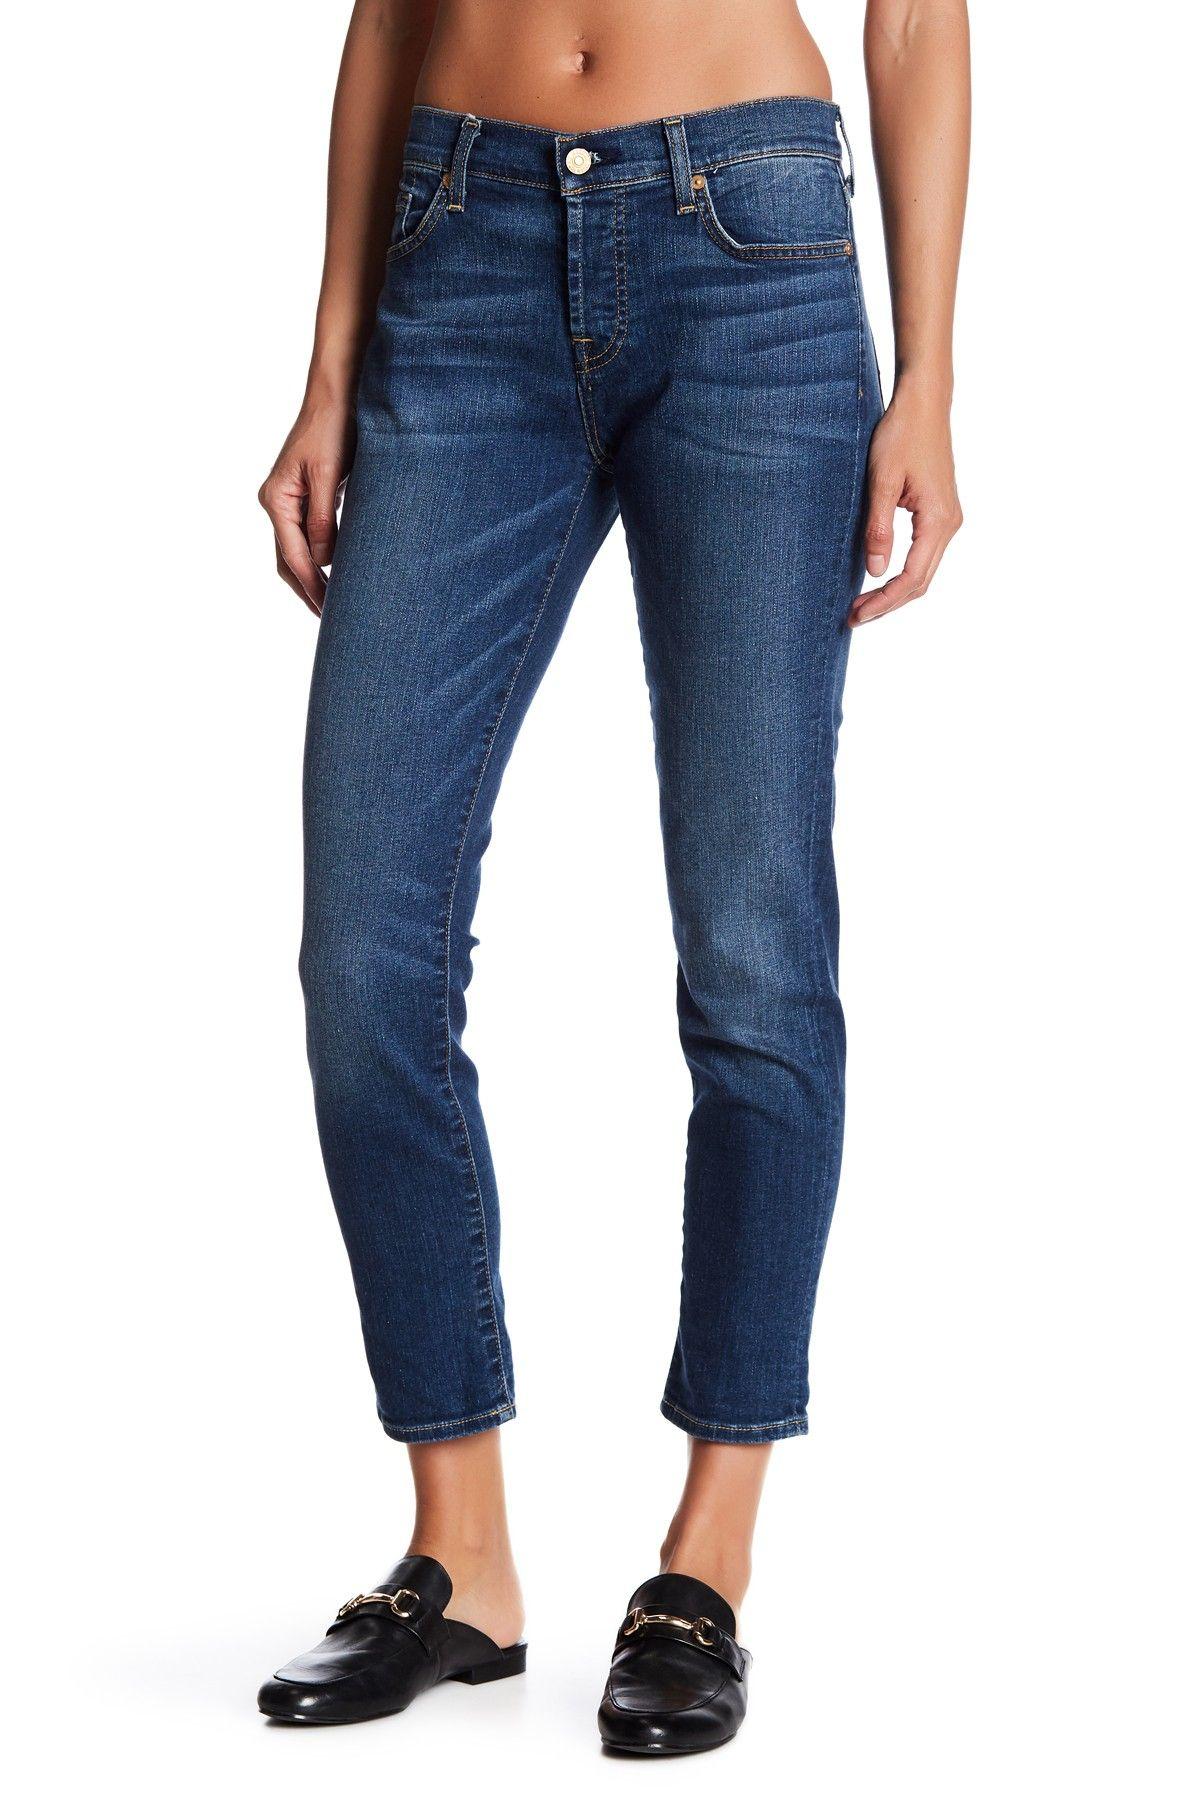 7 For All Mankind The Josefina Skinny Boyfriend Jeans